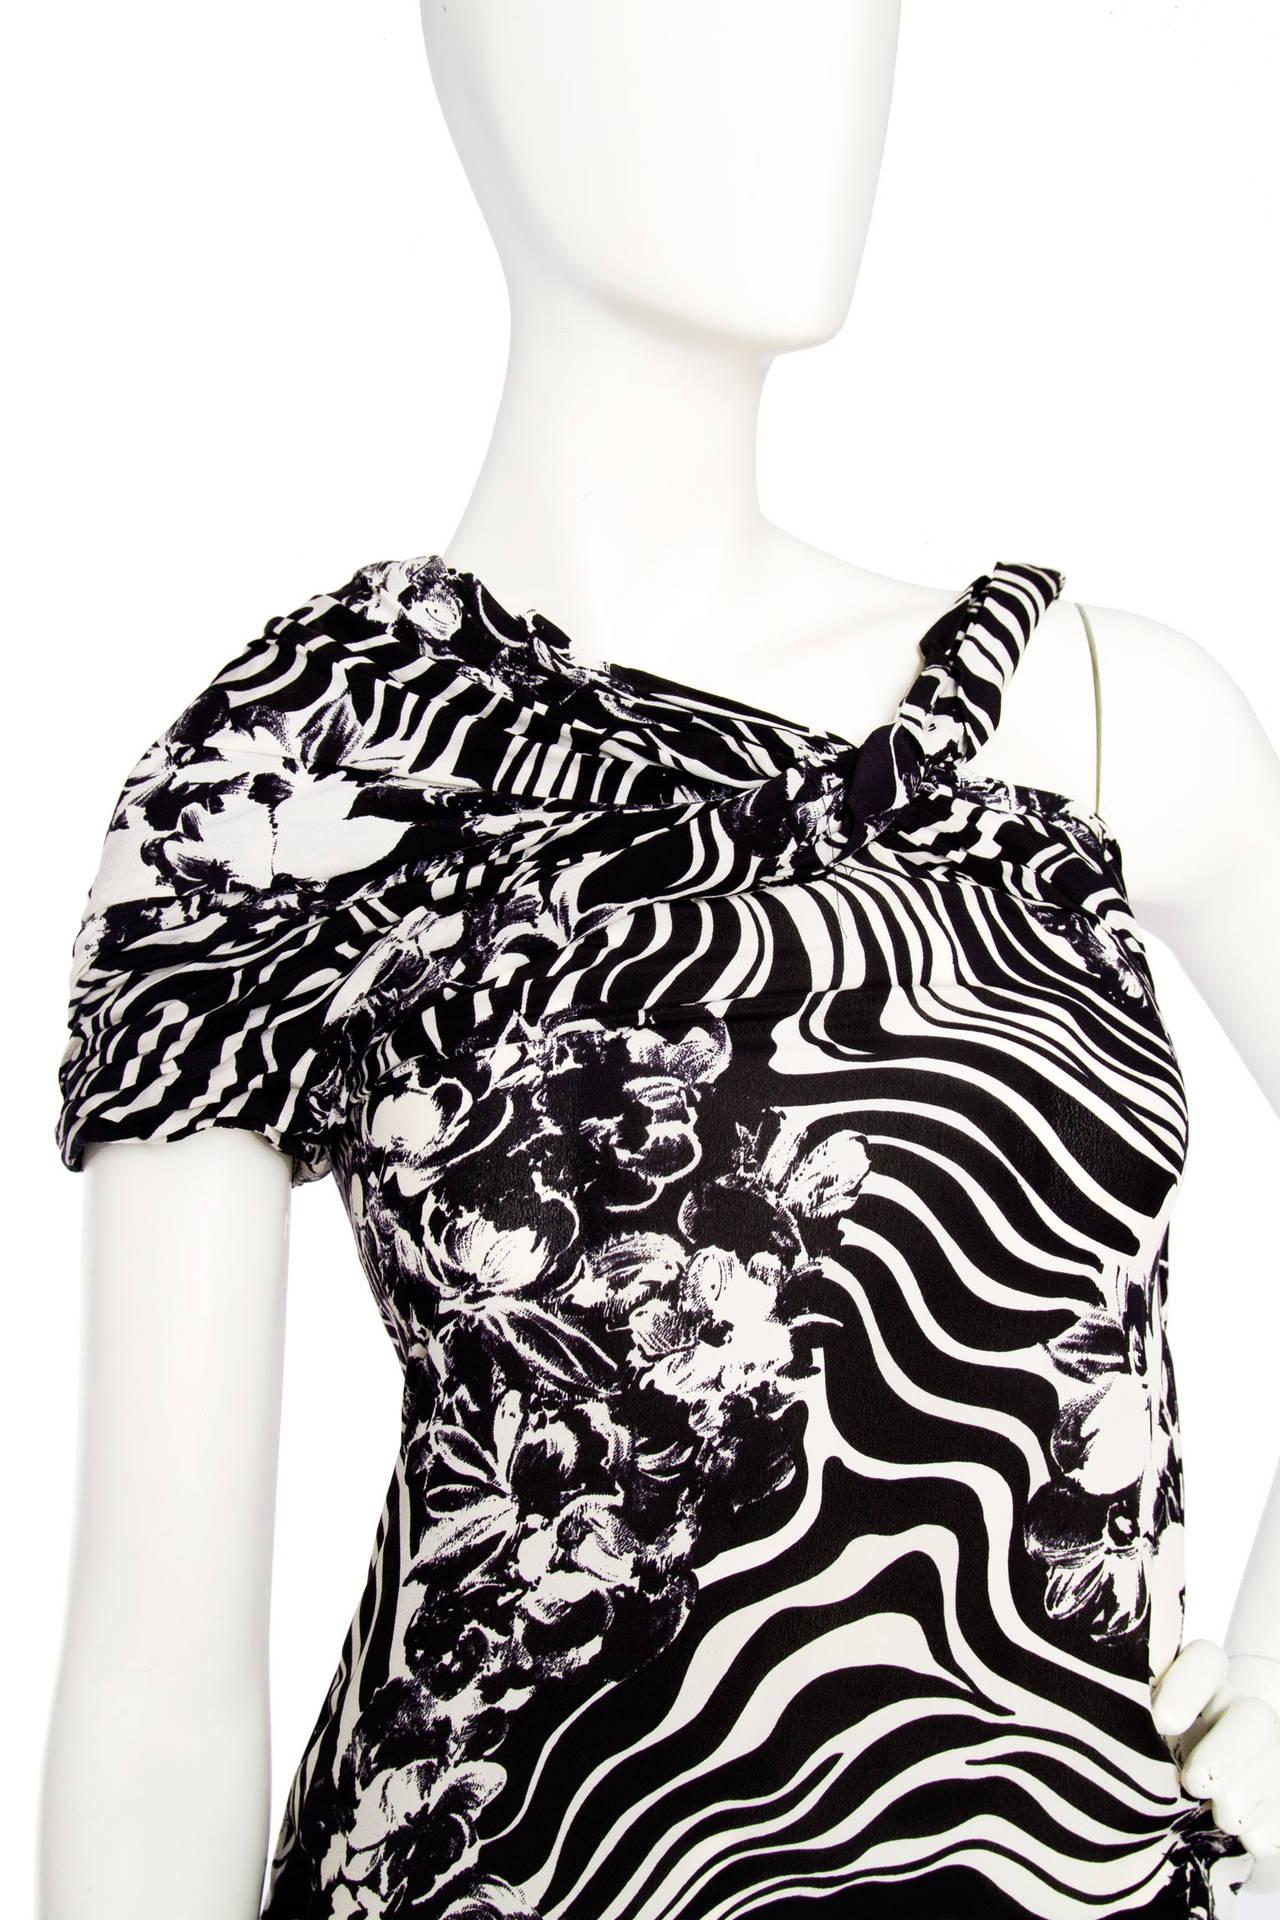 1980s Gianni Versace Monochrome Silk Dress 6